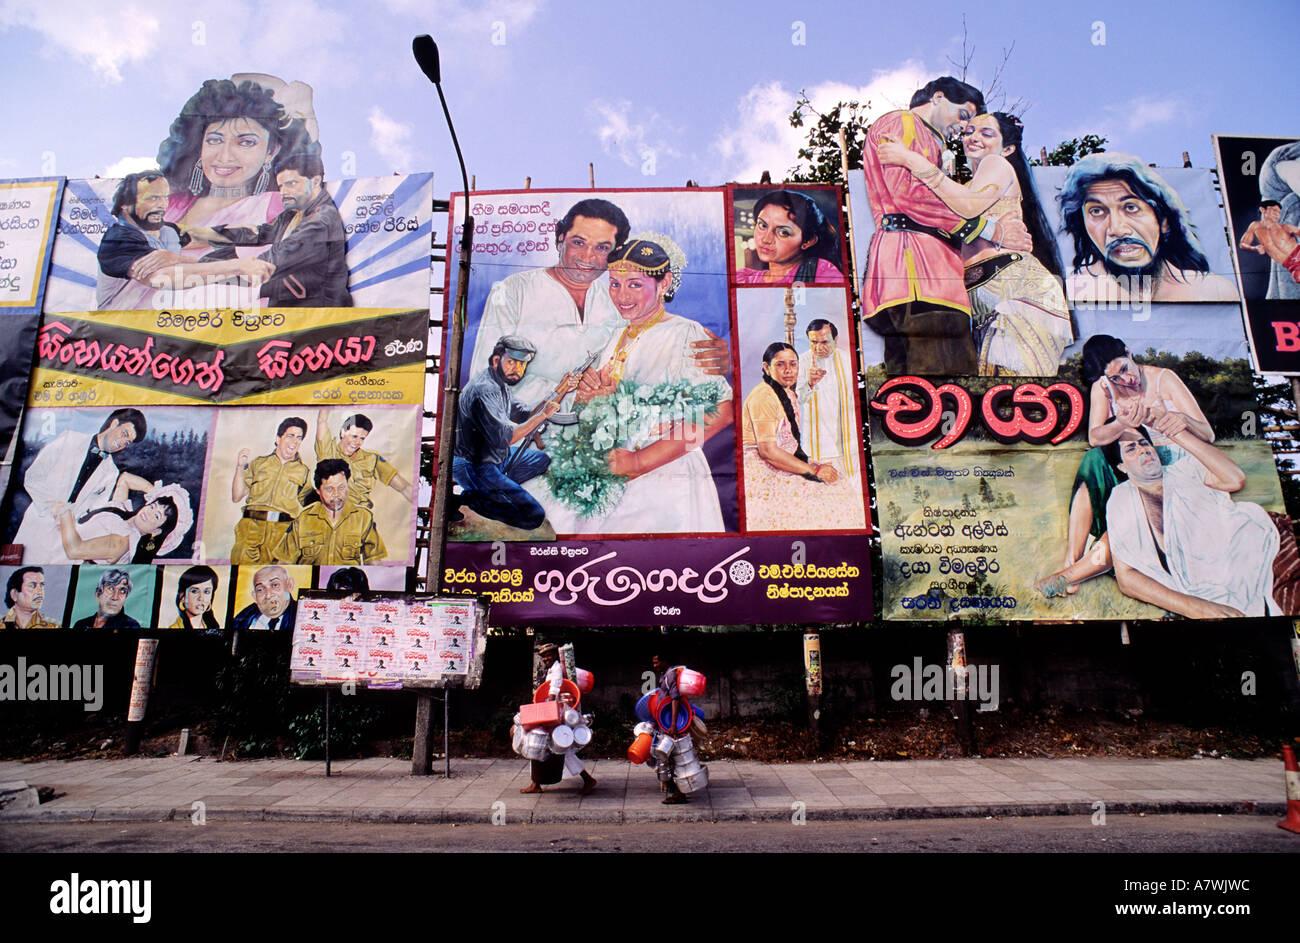 Sri Lanka, Colombo, cinema posters - Stock Image